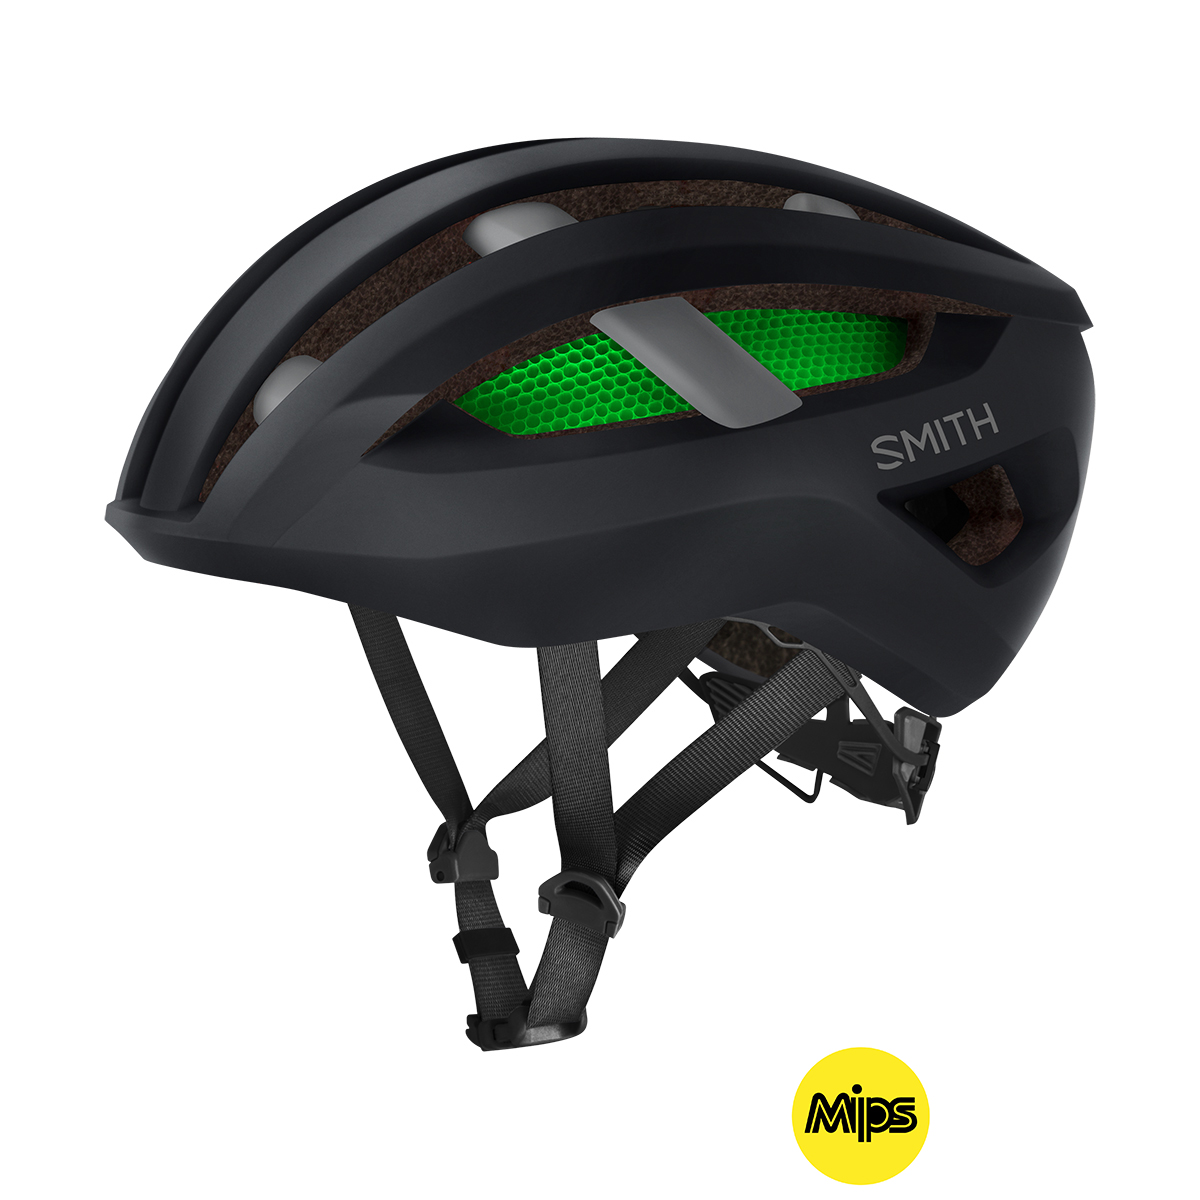 SMITH Network MIPS(スミス ネットワーク ミップス) ヘルメット 2018